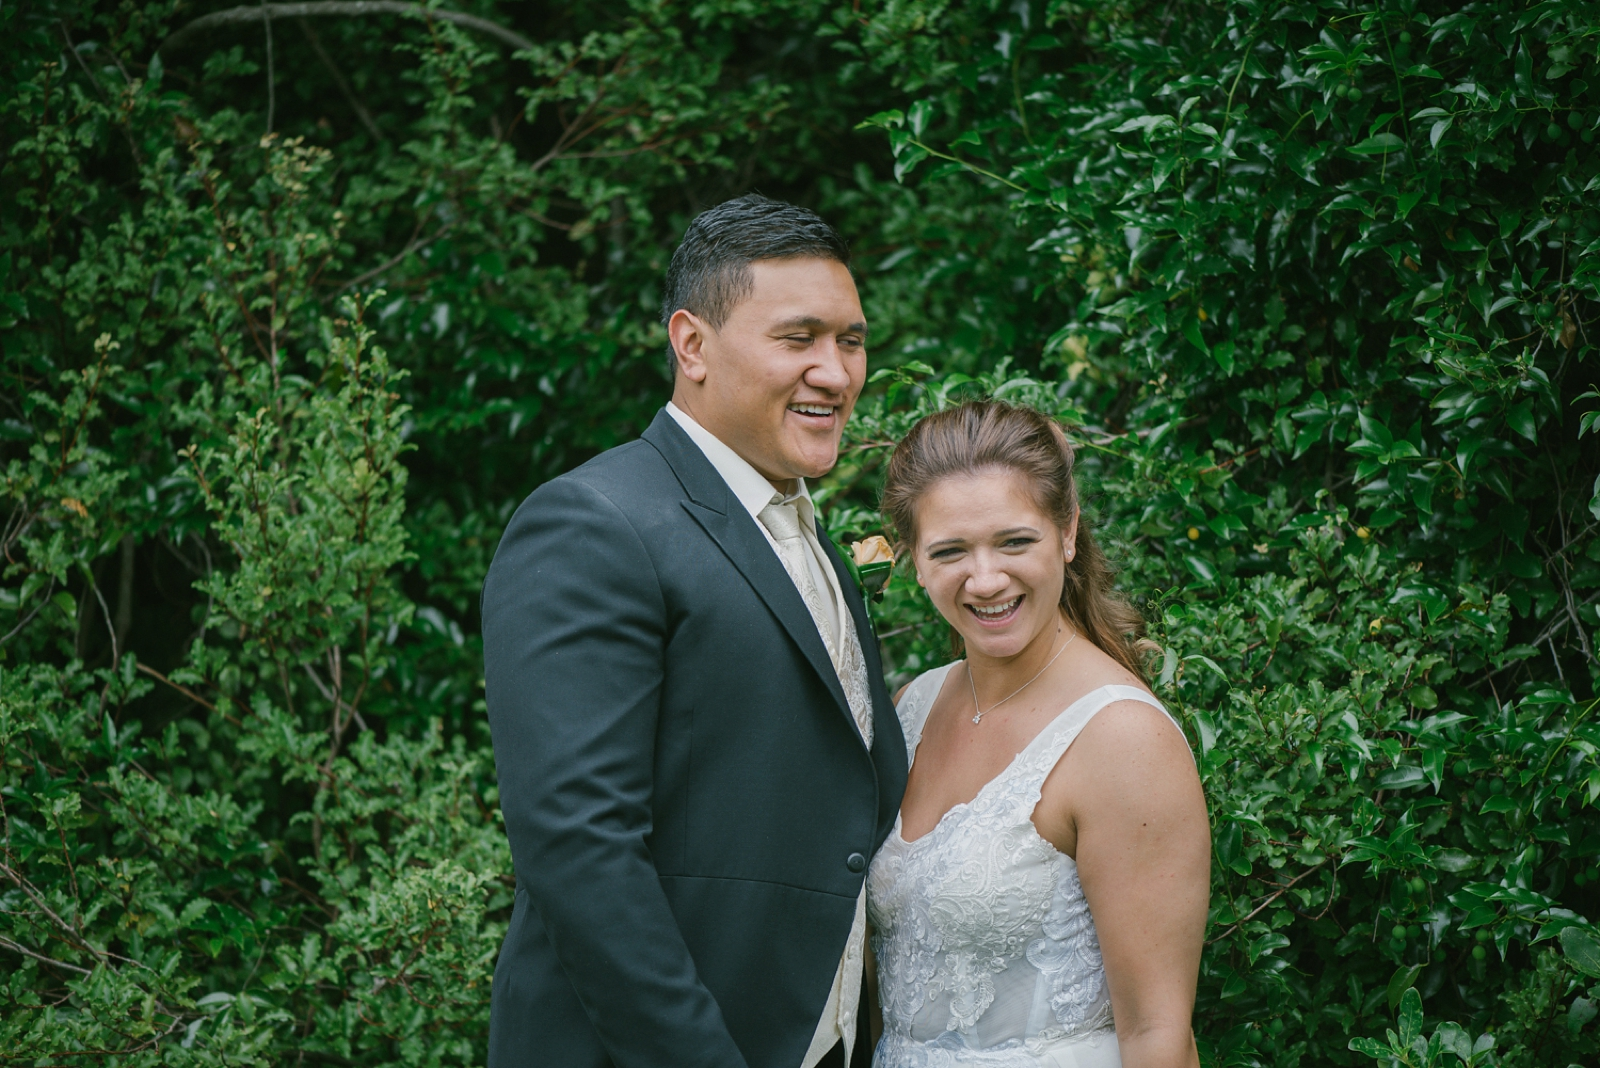 GabbyFiti_Auckland Wedding Photographer_Patty Lagera_0075.jpg